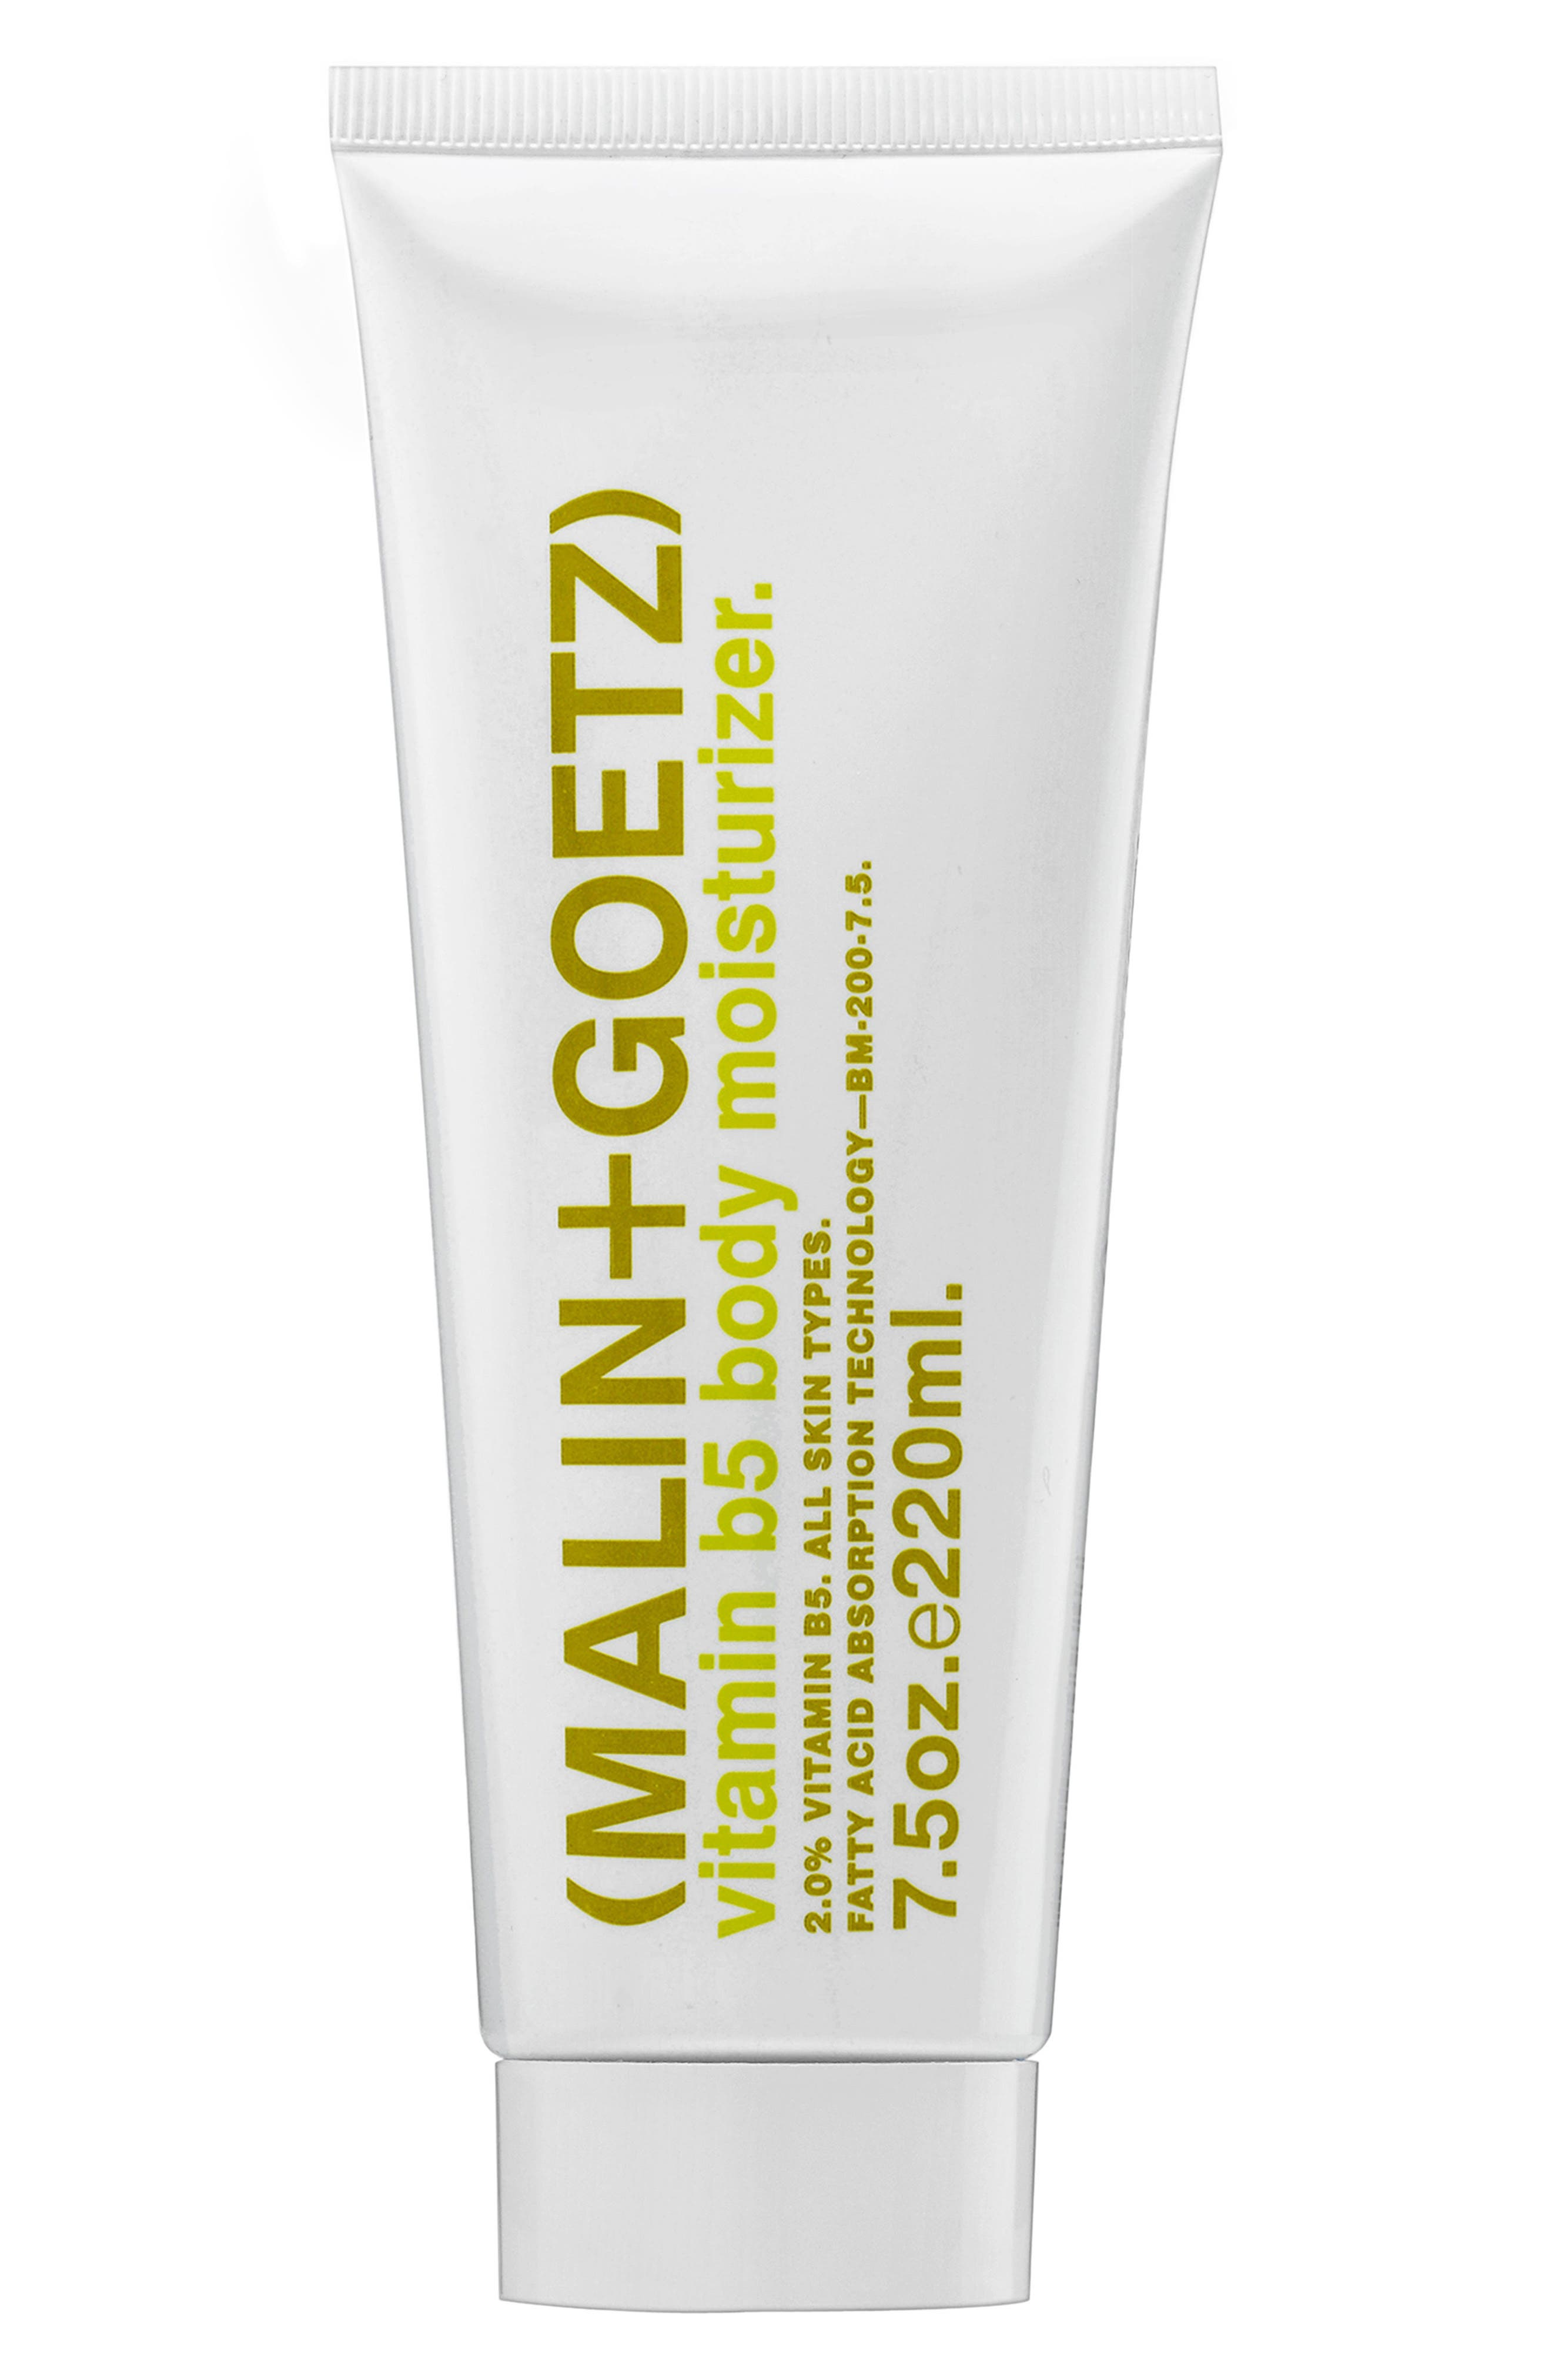 Main Image - Malin + Goetz Vitamin B5 Body Moisturizer